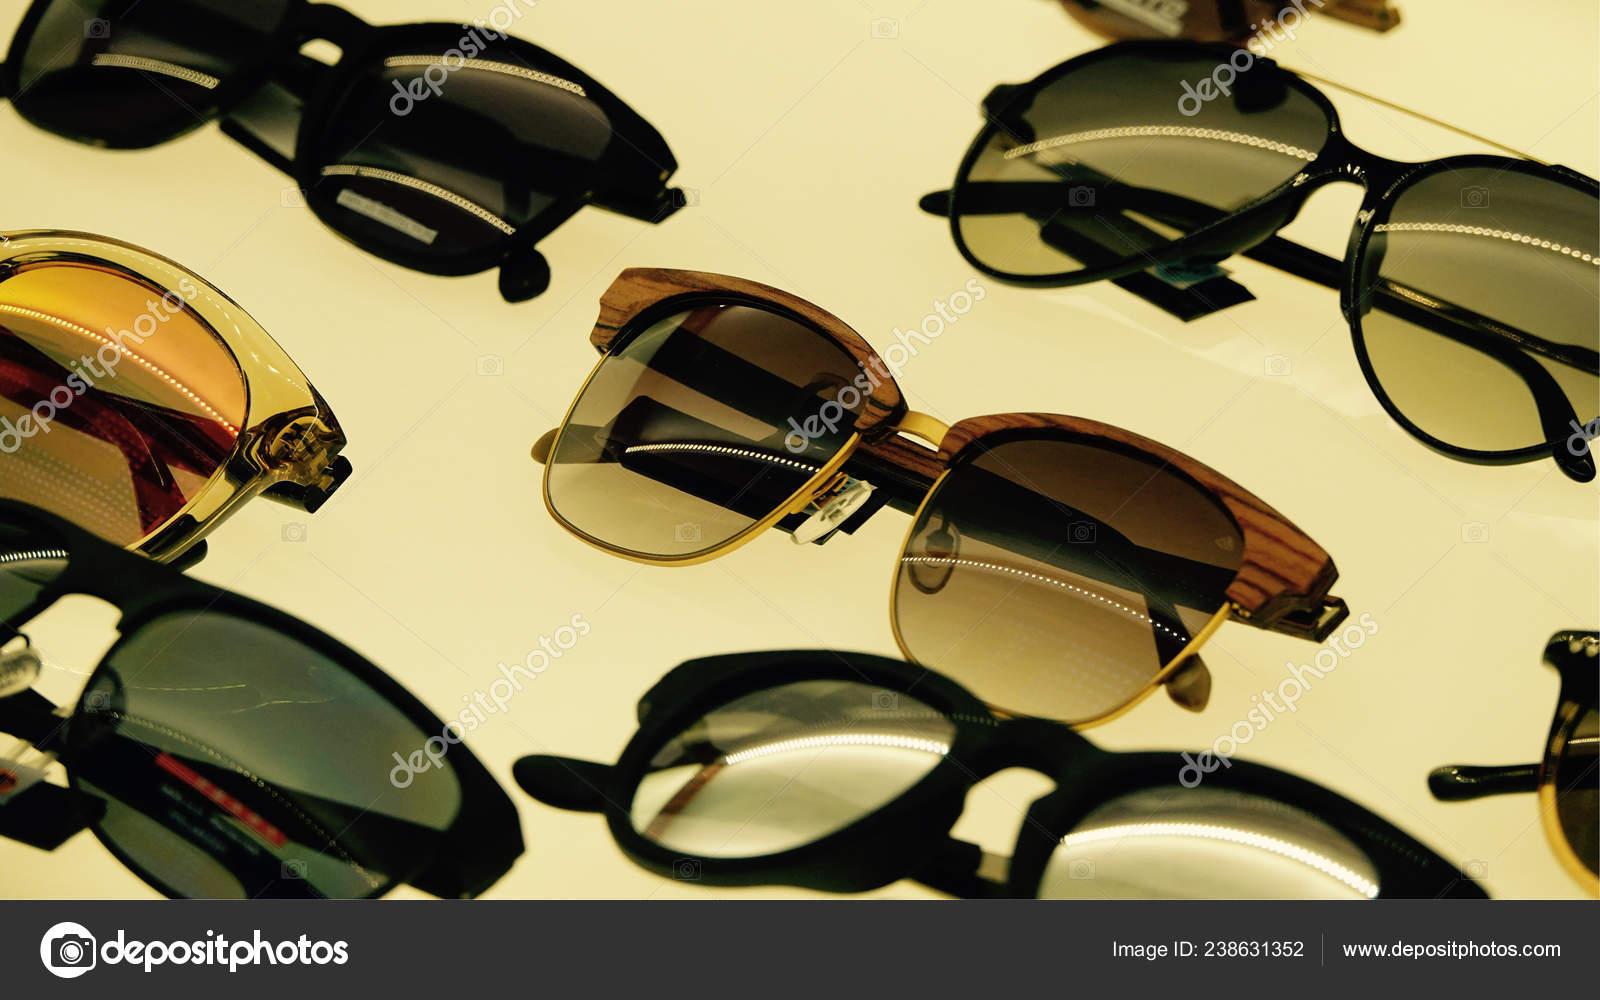 b787ab56152f Солнцезащитные Очки Магазине Антверпене — Стоковое фото ...